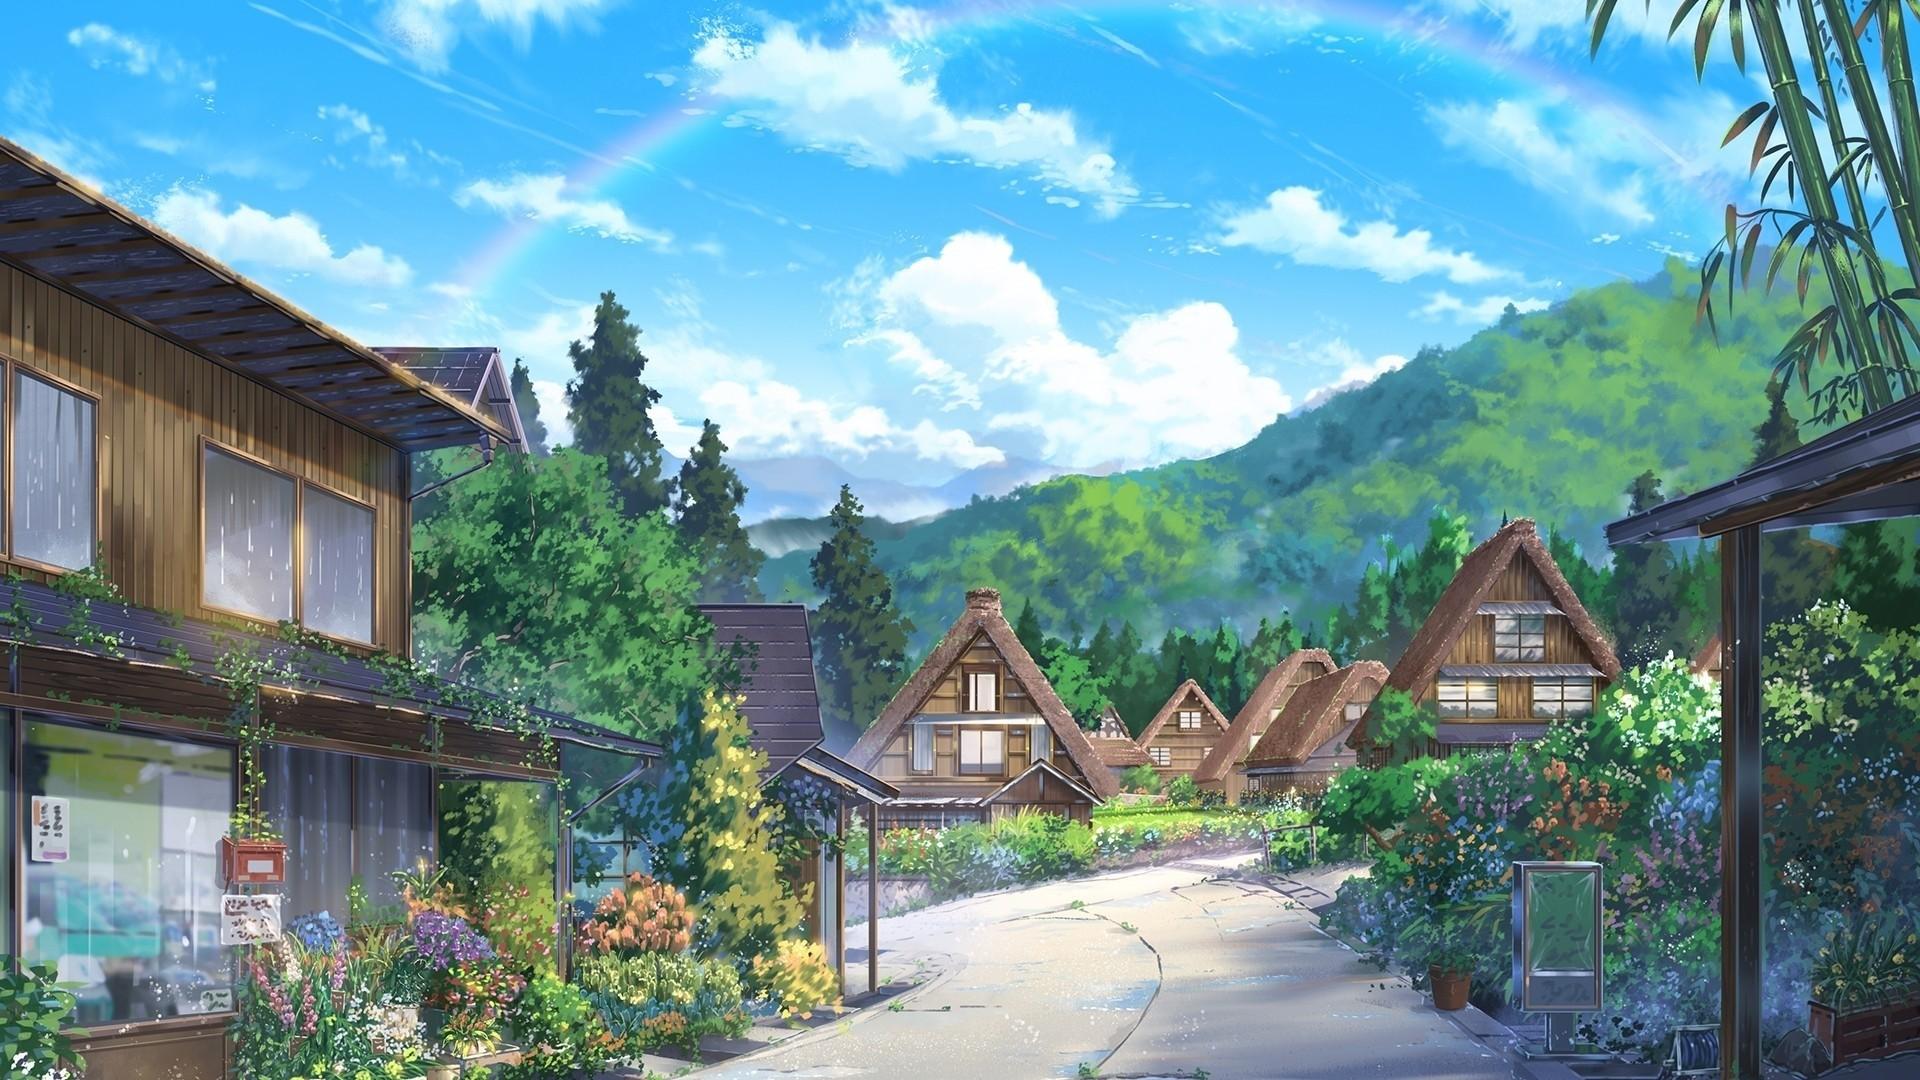 Leaf Village Wallpaper theme